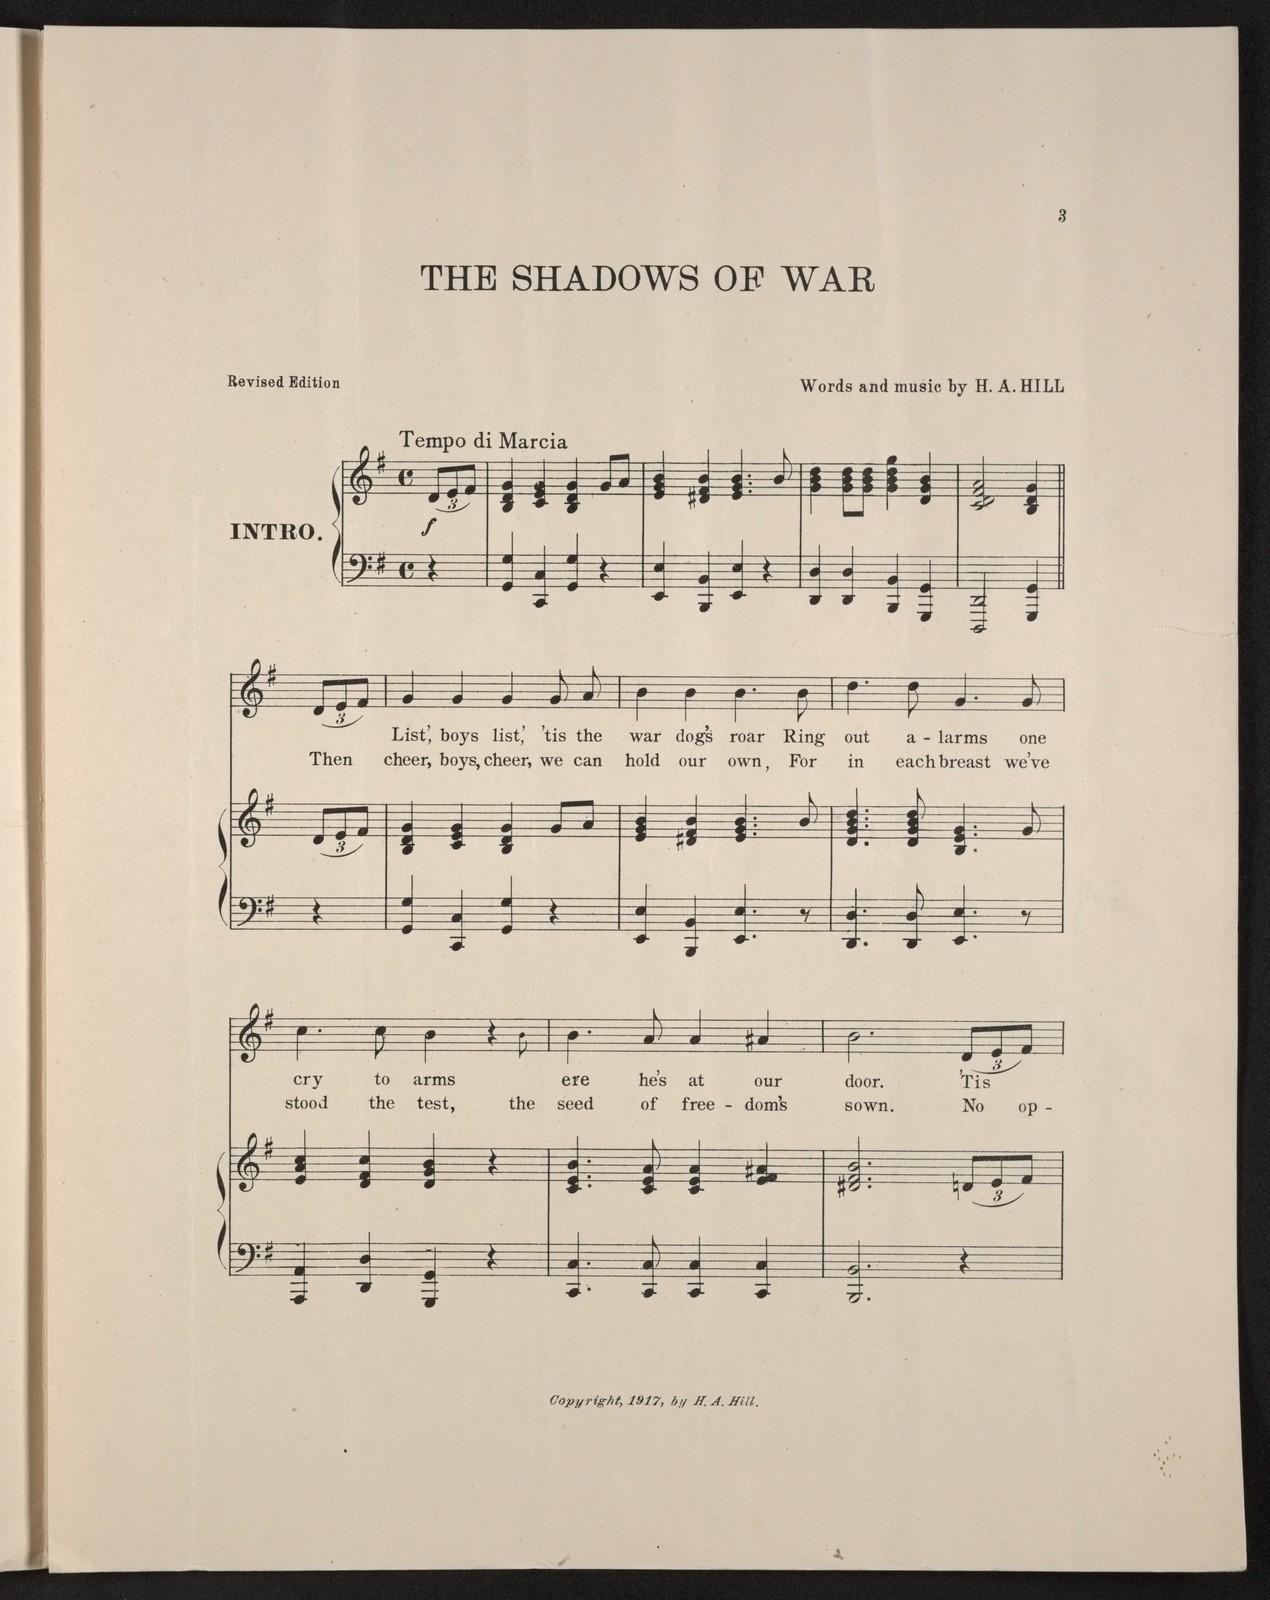 The  shadows of war